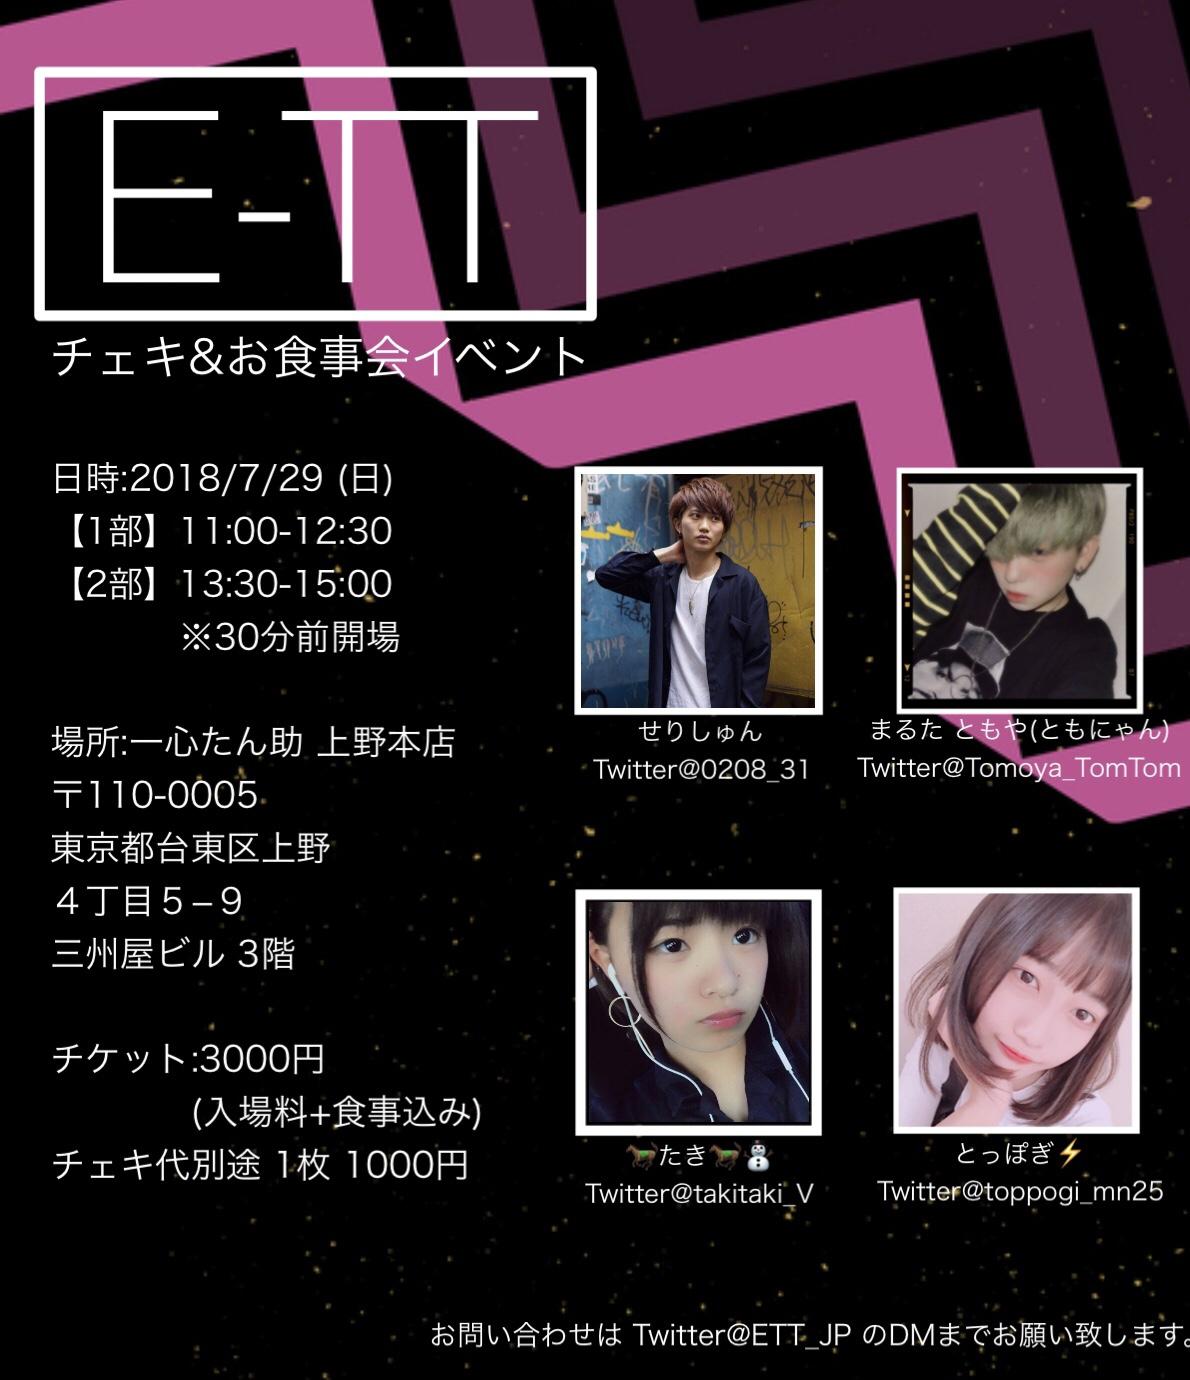 【E-TT主催】人気クリエイター × お食事&チェキ会イベント